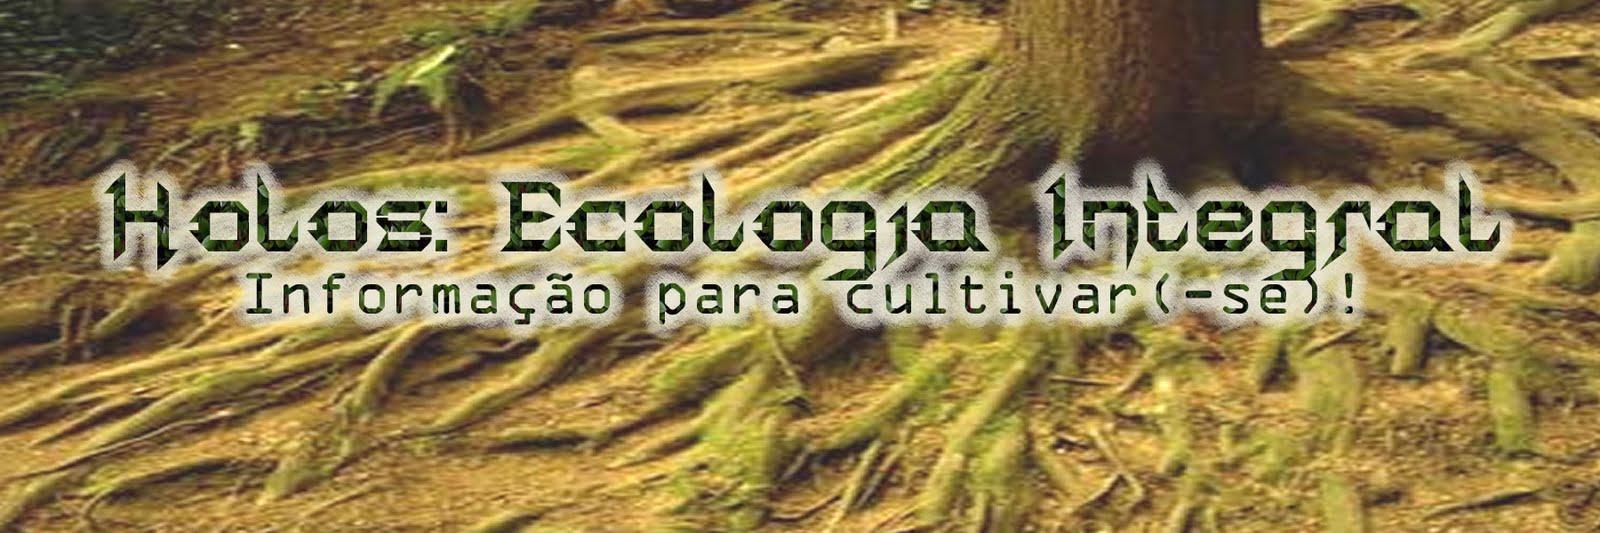 Holos: Ecologia Integral